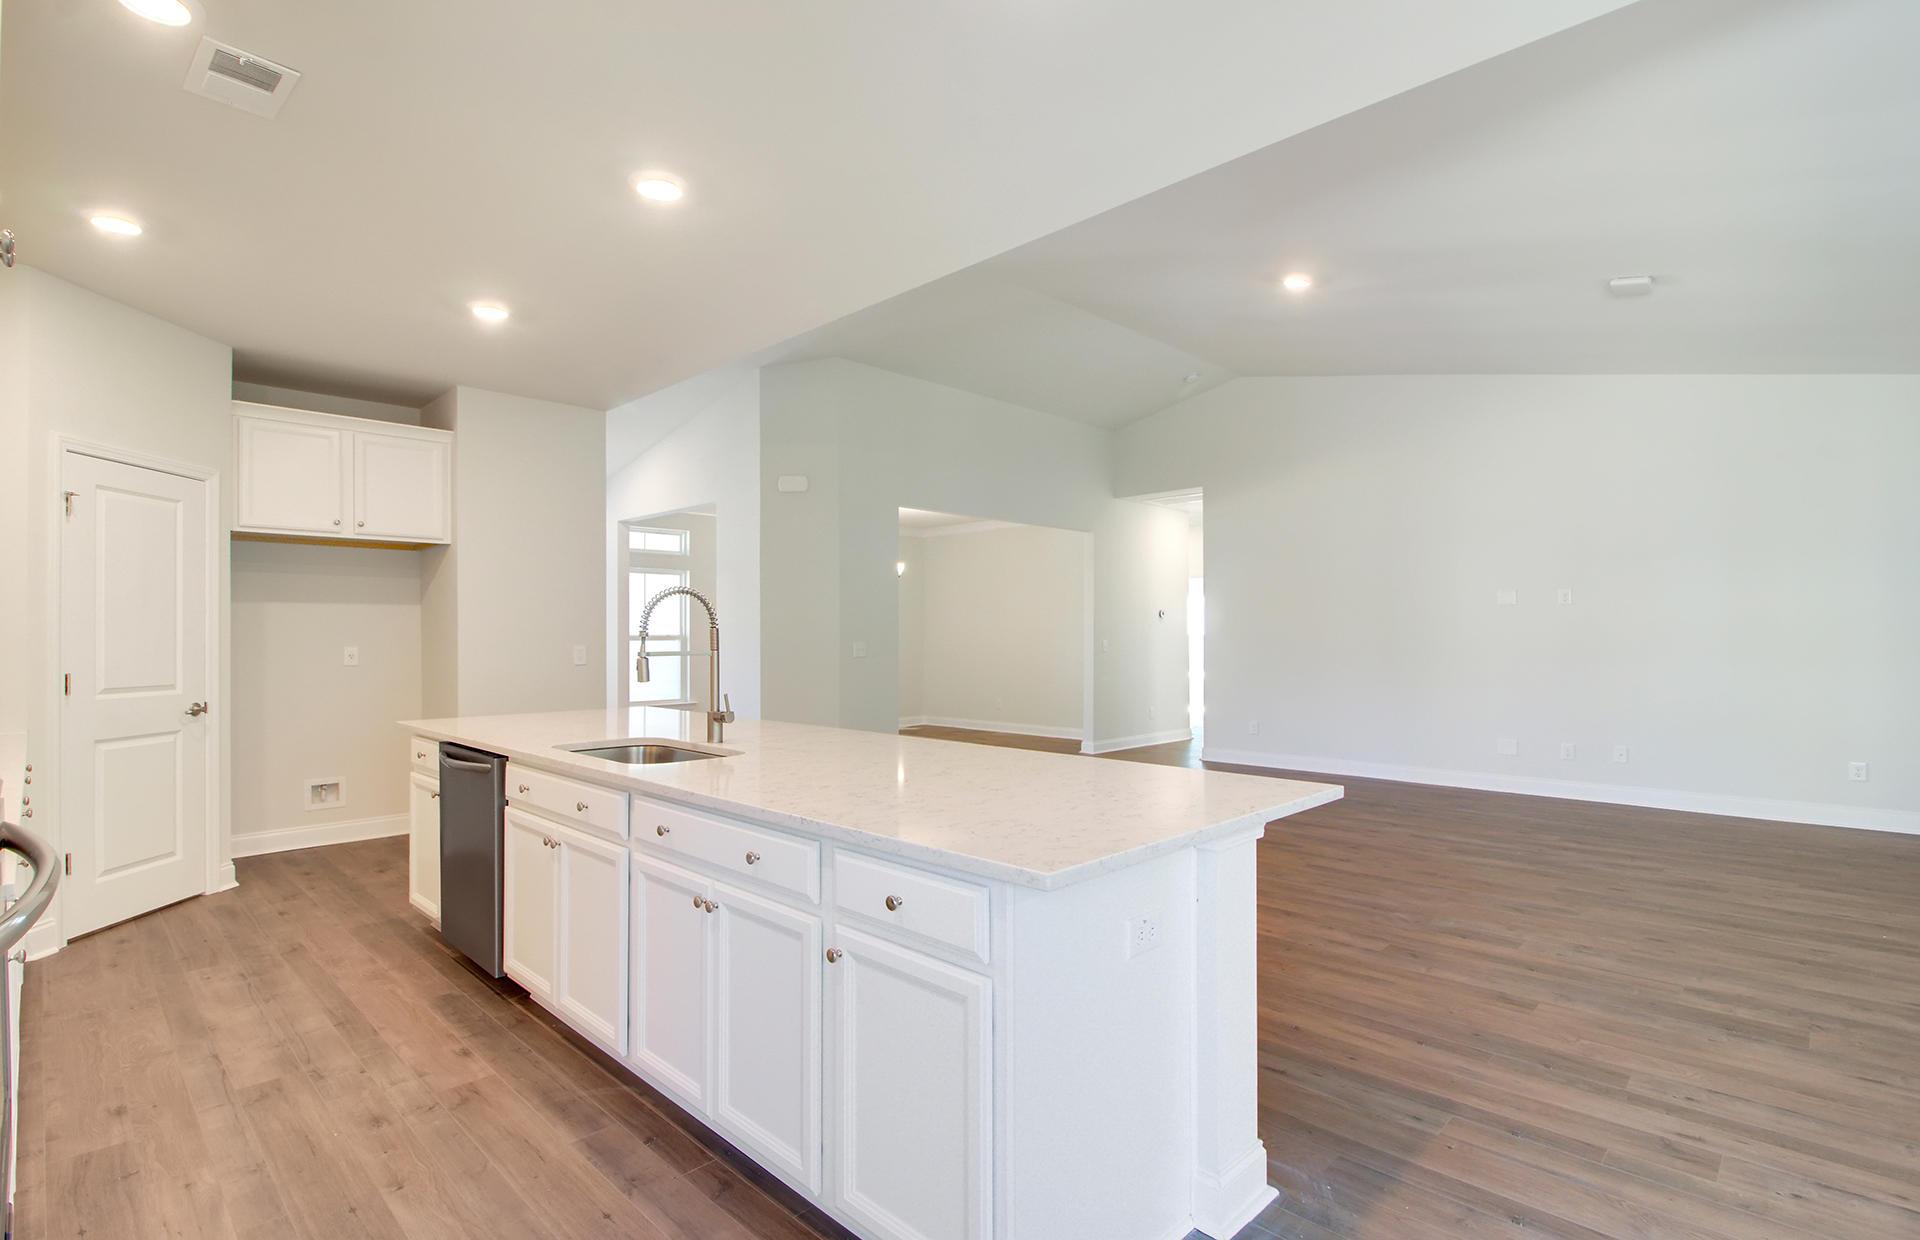 Park West Homes For Sale - 3066 Rice Field, Mount Pleasant, SC - 55